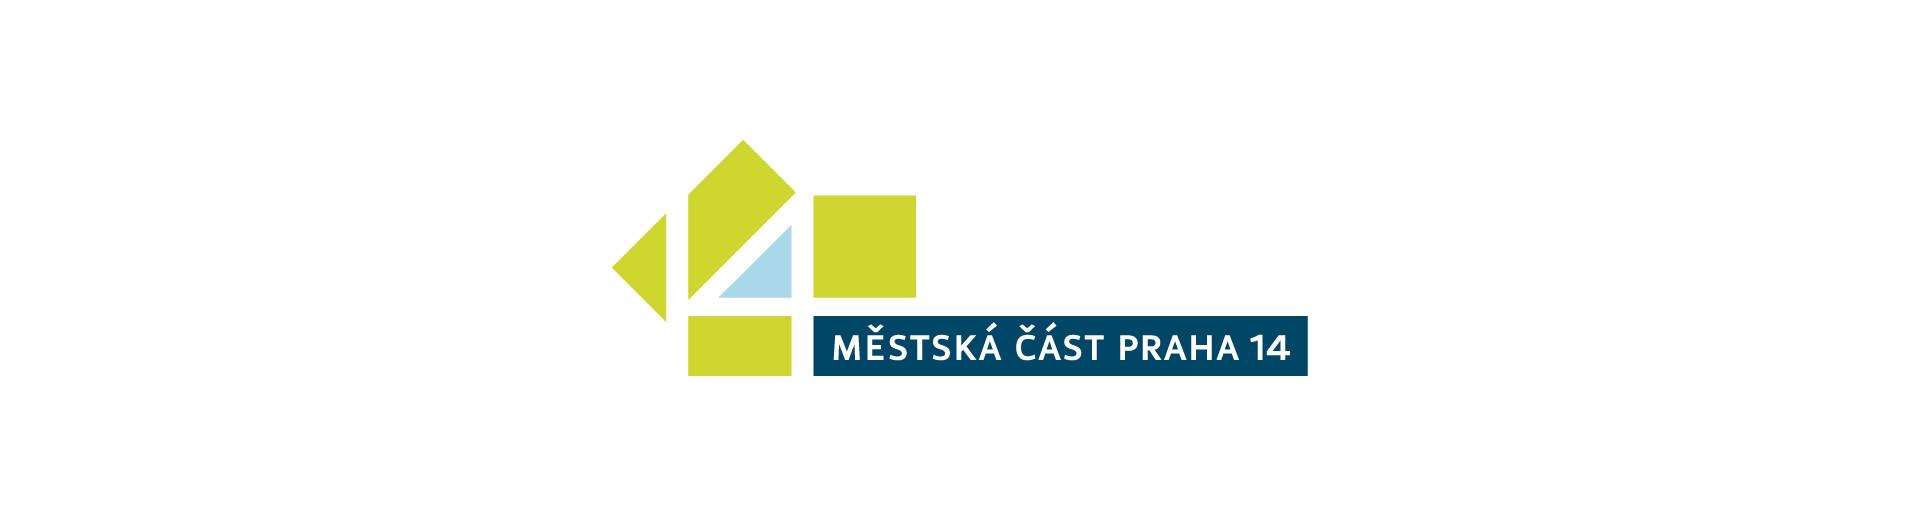 mestska_cast_praha_14